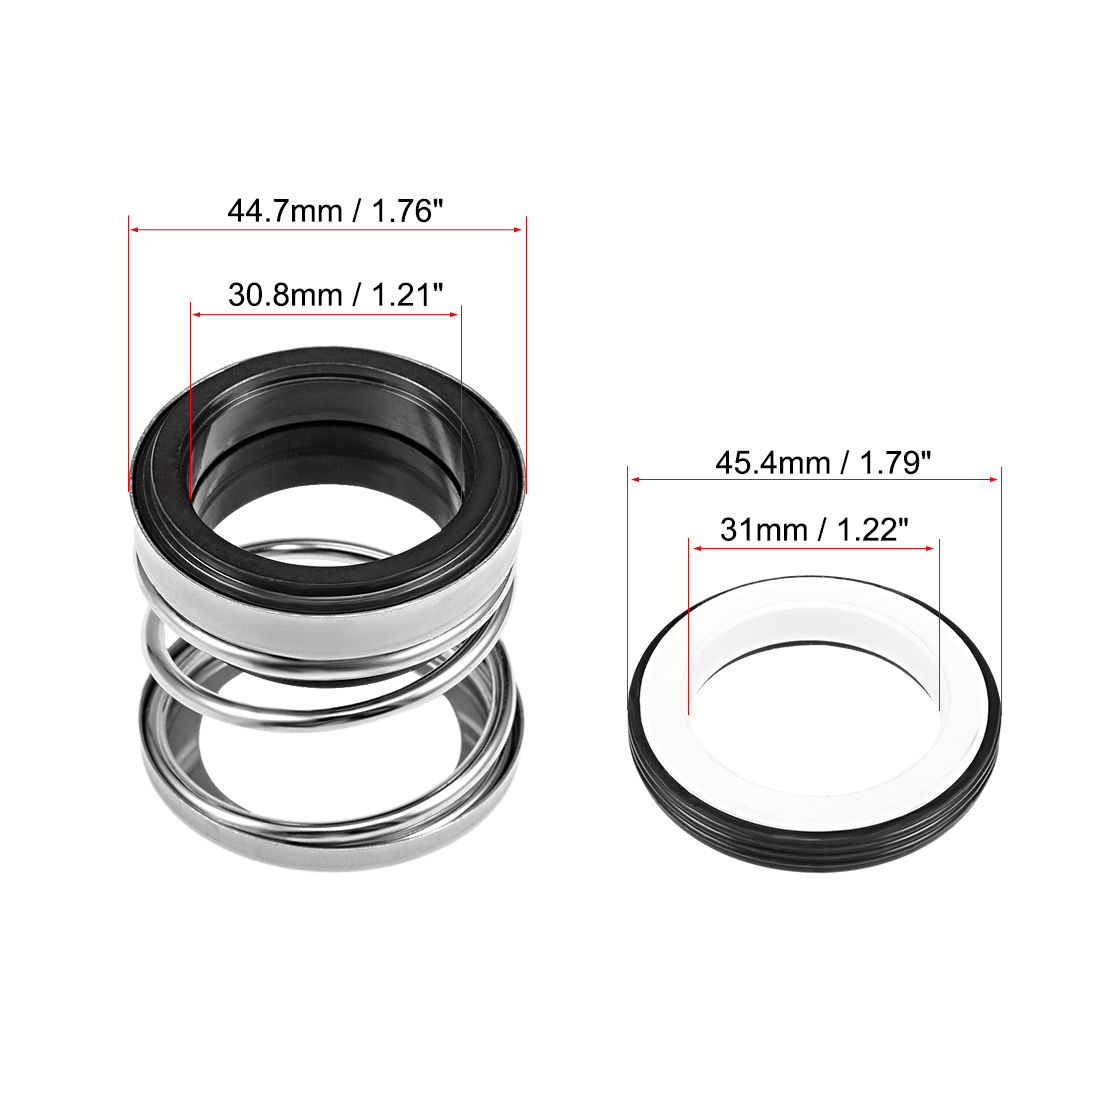 Mechanical Shaft Seal Replacement for Pool Spa Pump 2pcs 108-30 - image 3 de 4